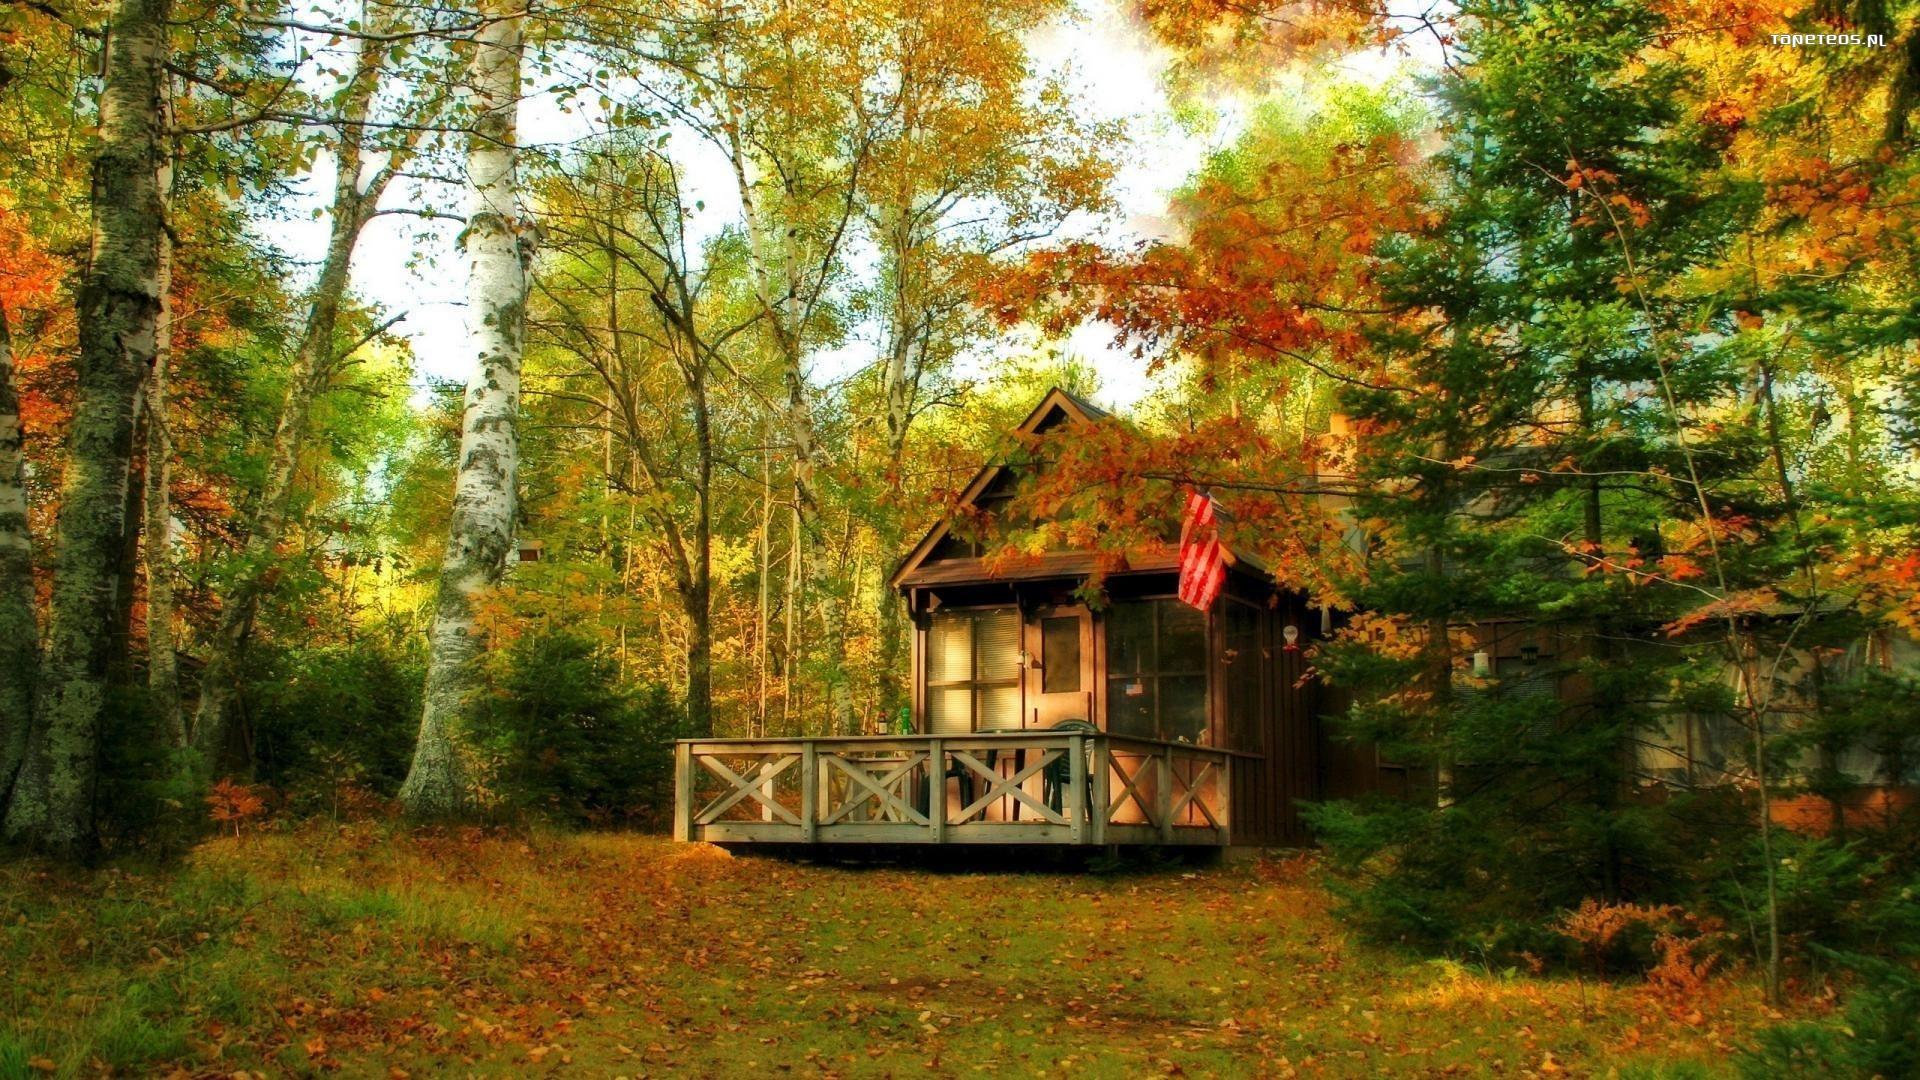 Jesien 1920x1080 016 Dom Drzewa Tapety Na Pulpit